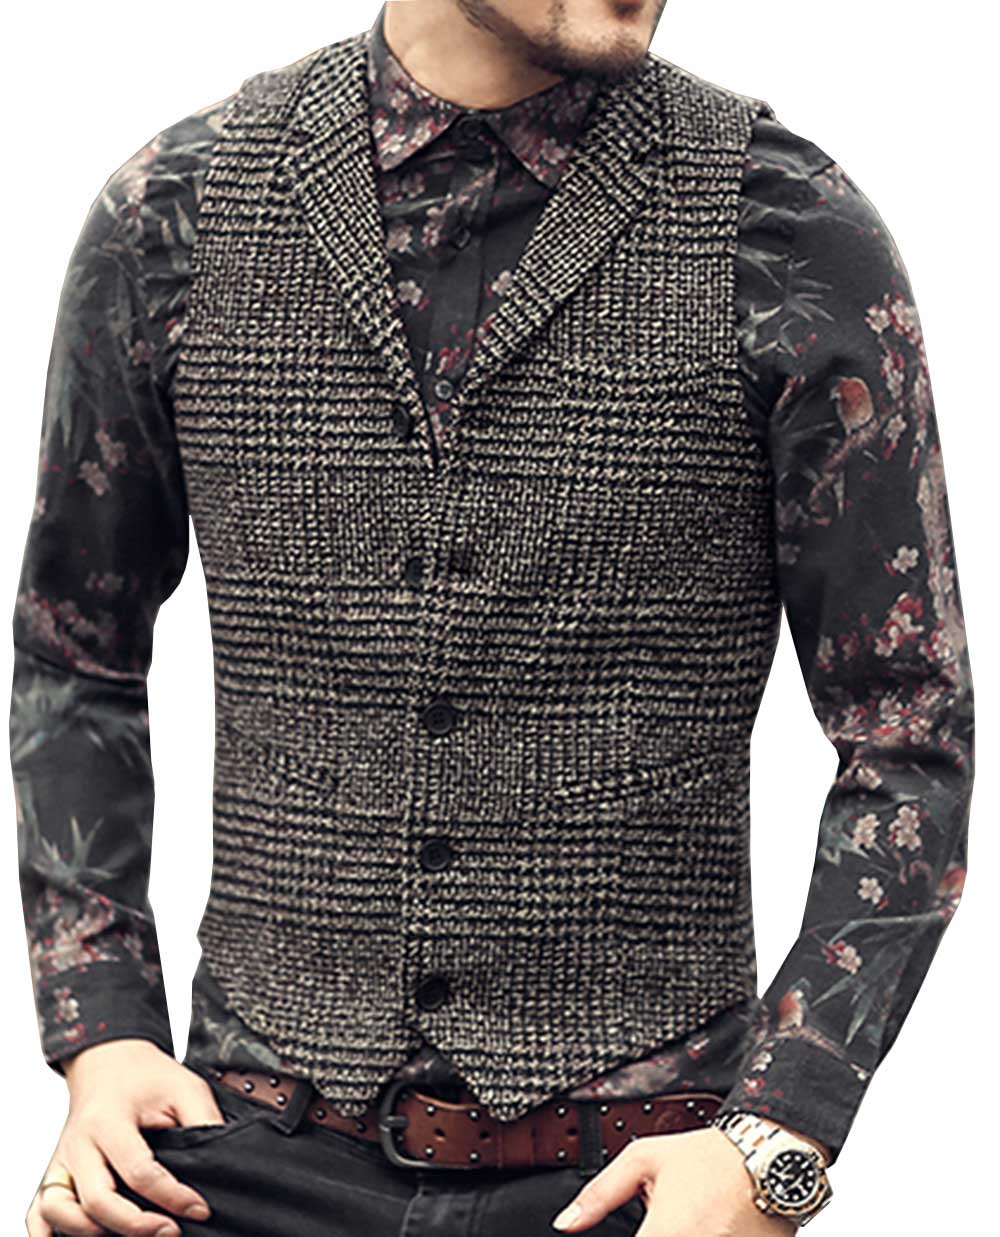 Mens Suit Vest Lapel Neck Wool Brown Single-breasted Slim Fit Waistcoat Casual Formal Business Groomman For Wedding Best Man